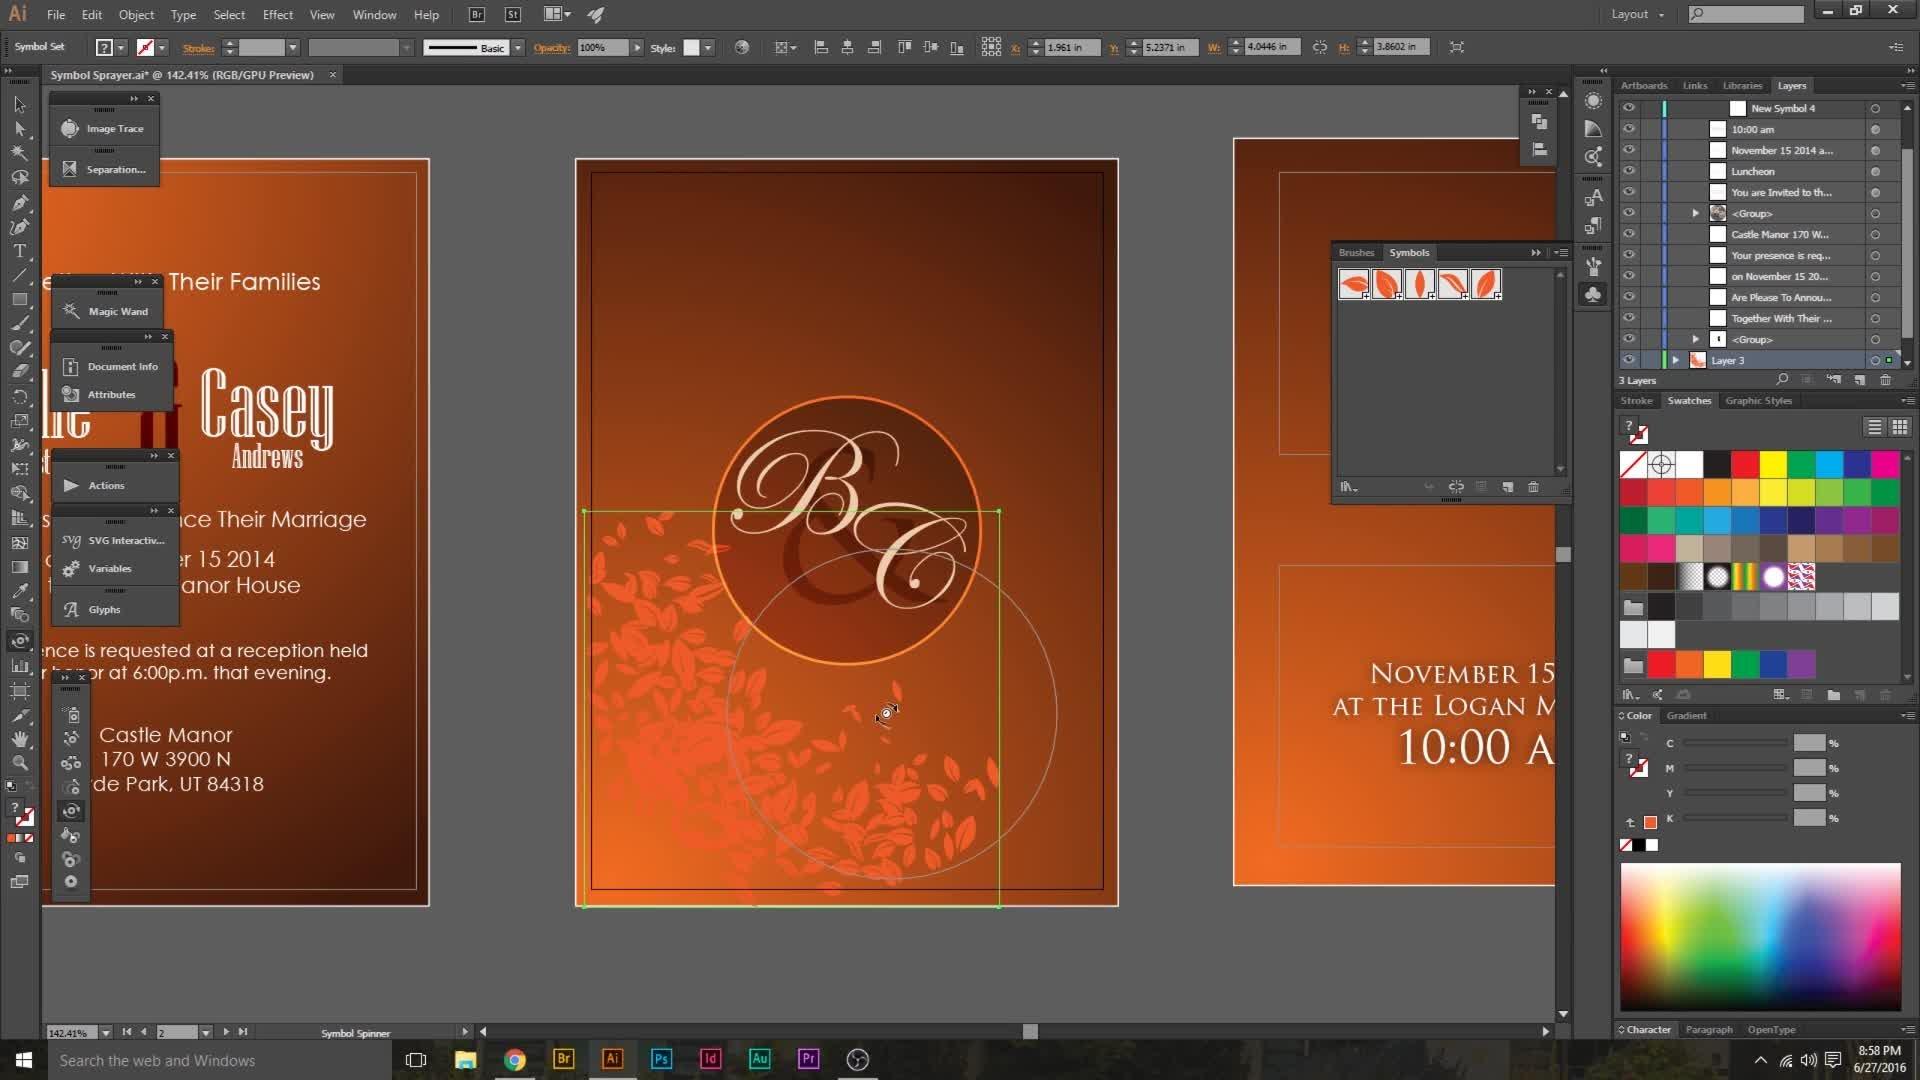 Adobe illustrator secrets tools they dont teach you joshua adobe illustrator secrets tools they dont teach you joshua butts skillshare biocorpaavc